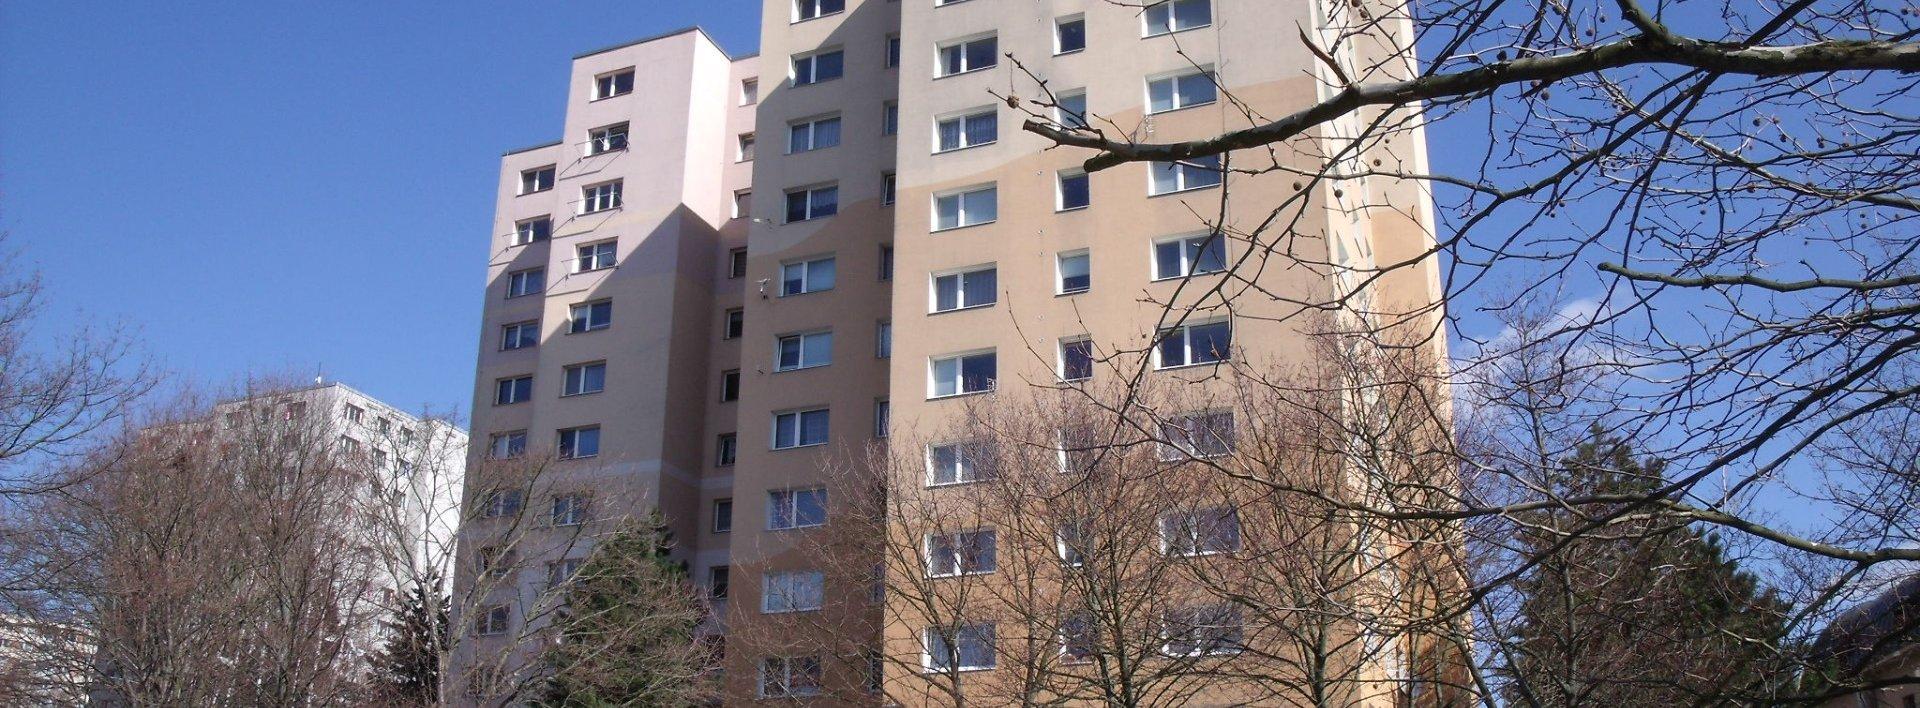 Prodej bytu 3+1 v OV, Liberec - Ruprechtice, ul. Borový Vrch, Ev.č.: N48695